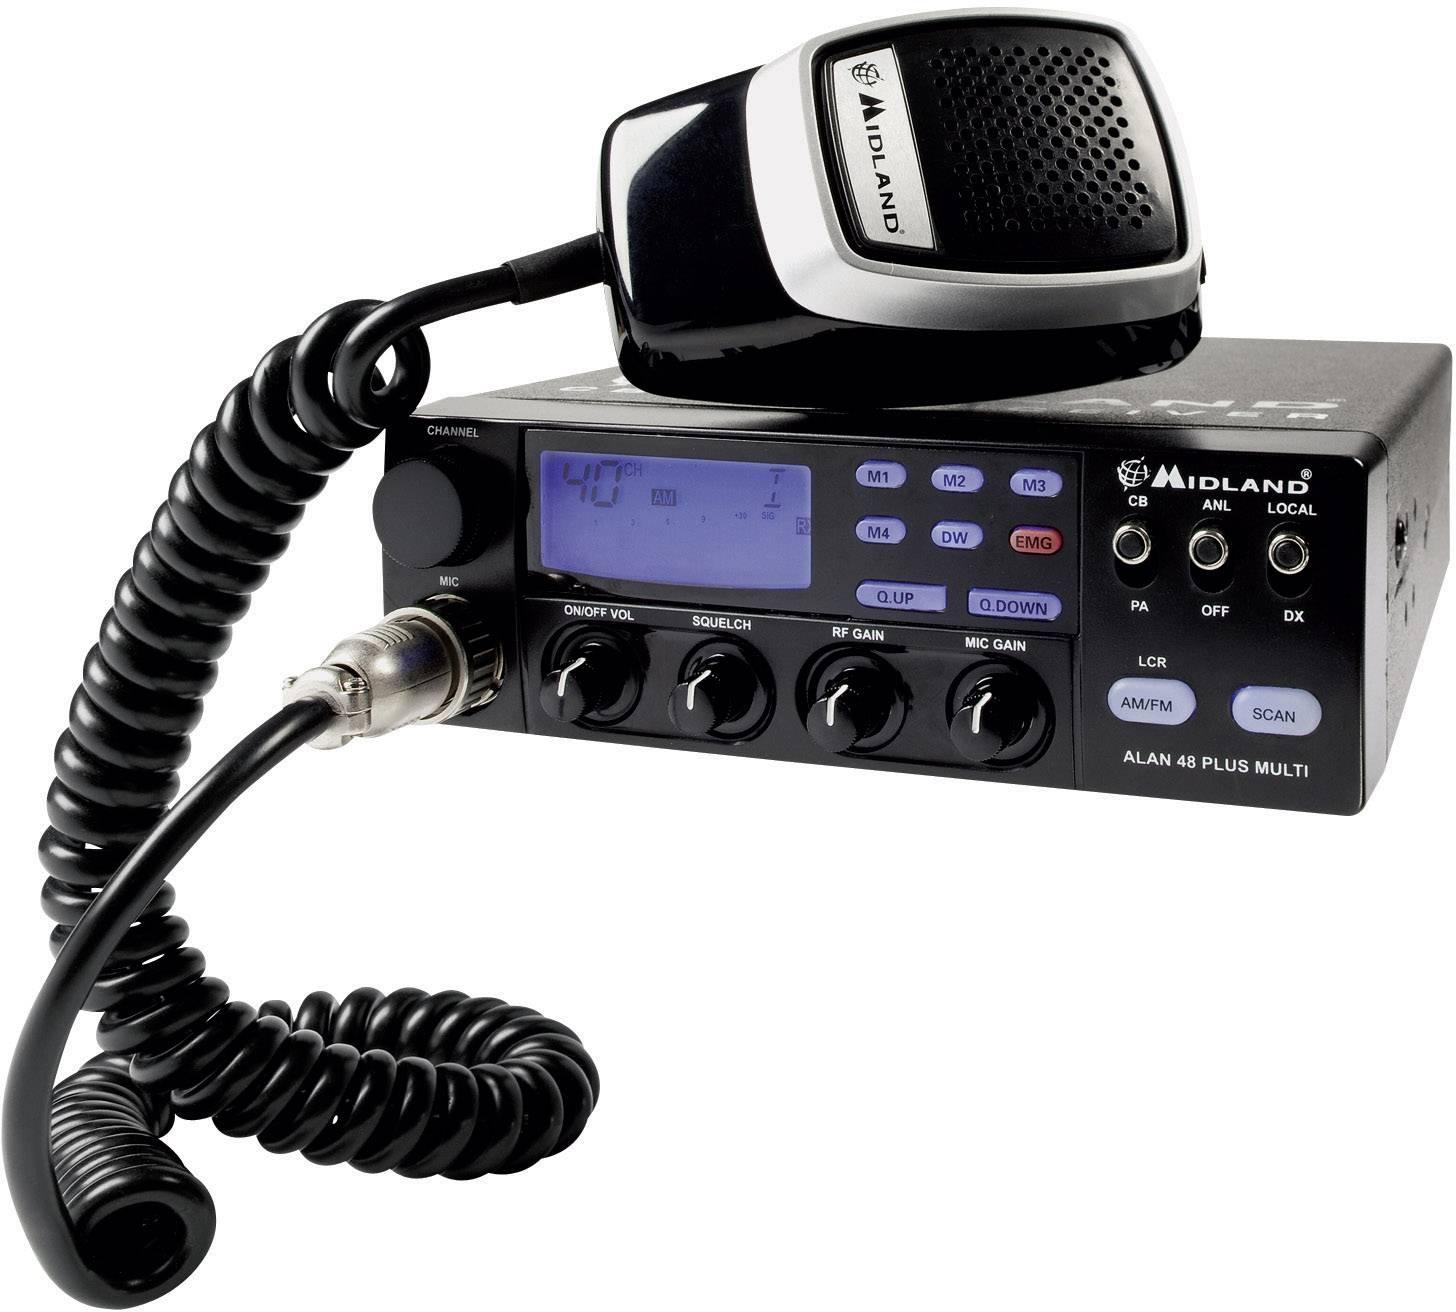 CB mobilní radiostanice Midland ALAN 48 B Plus